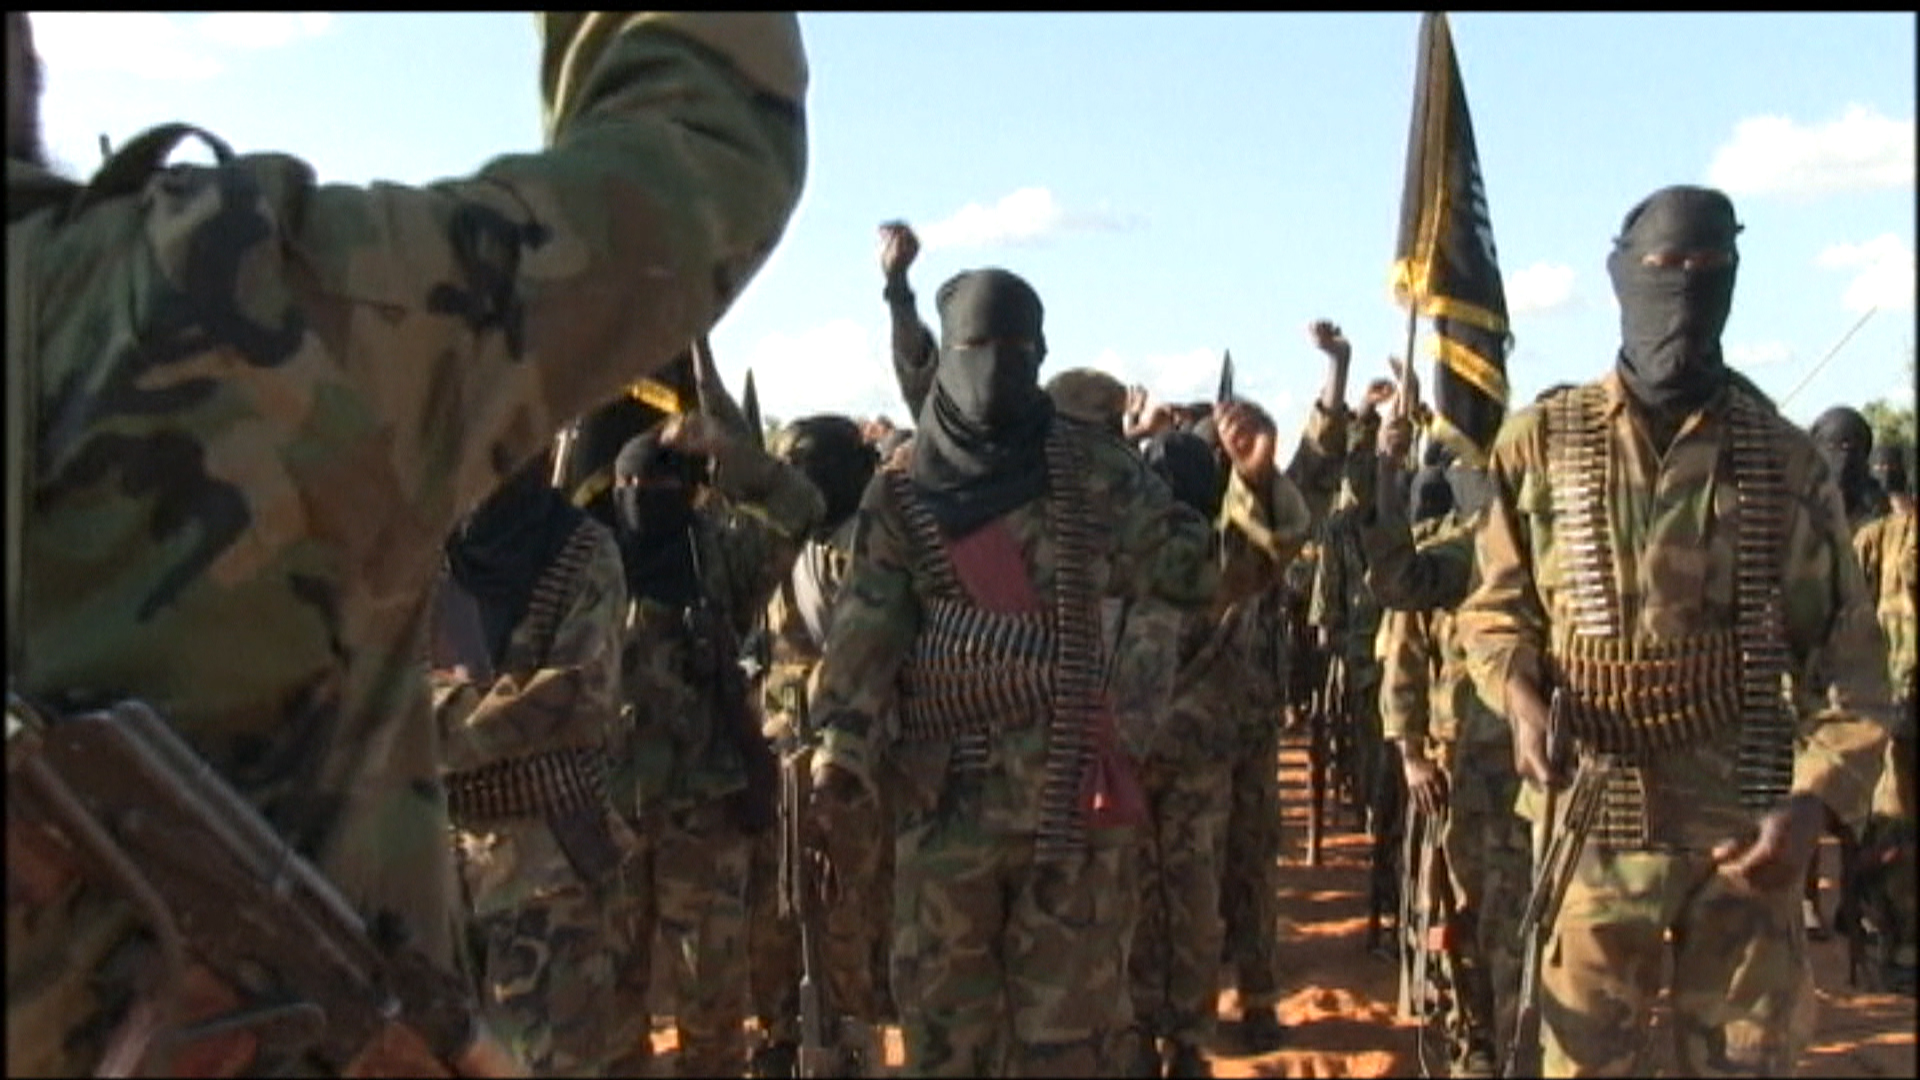 U.S. Targets Al-Shabab Leader in Somalia Airstrike